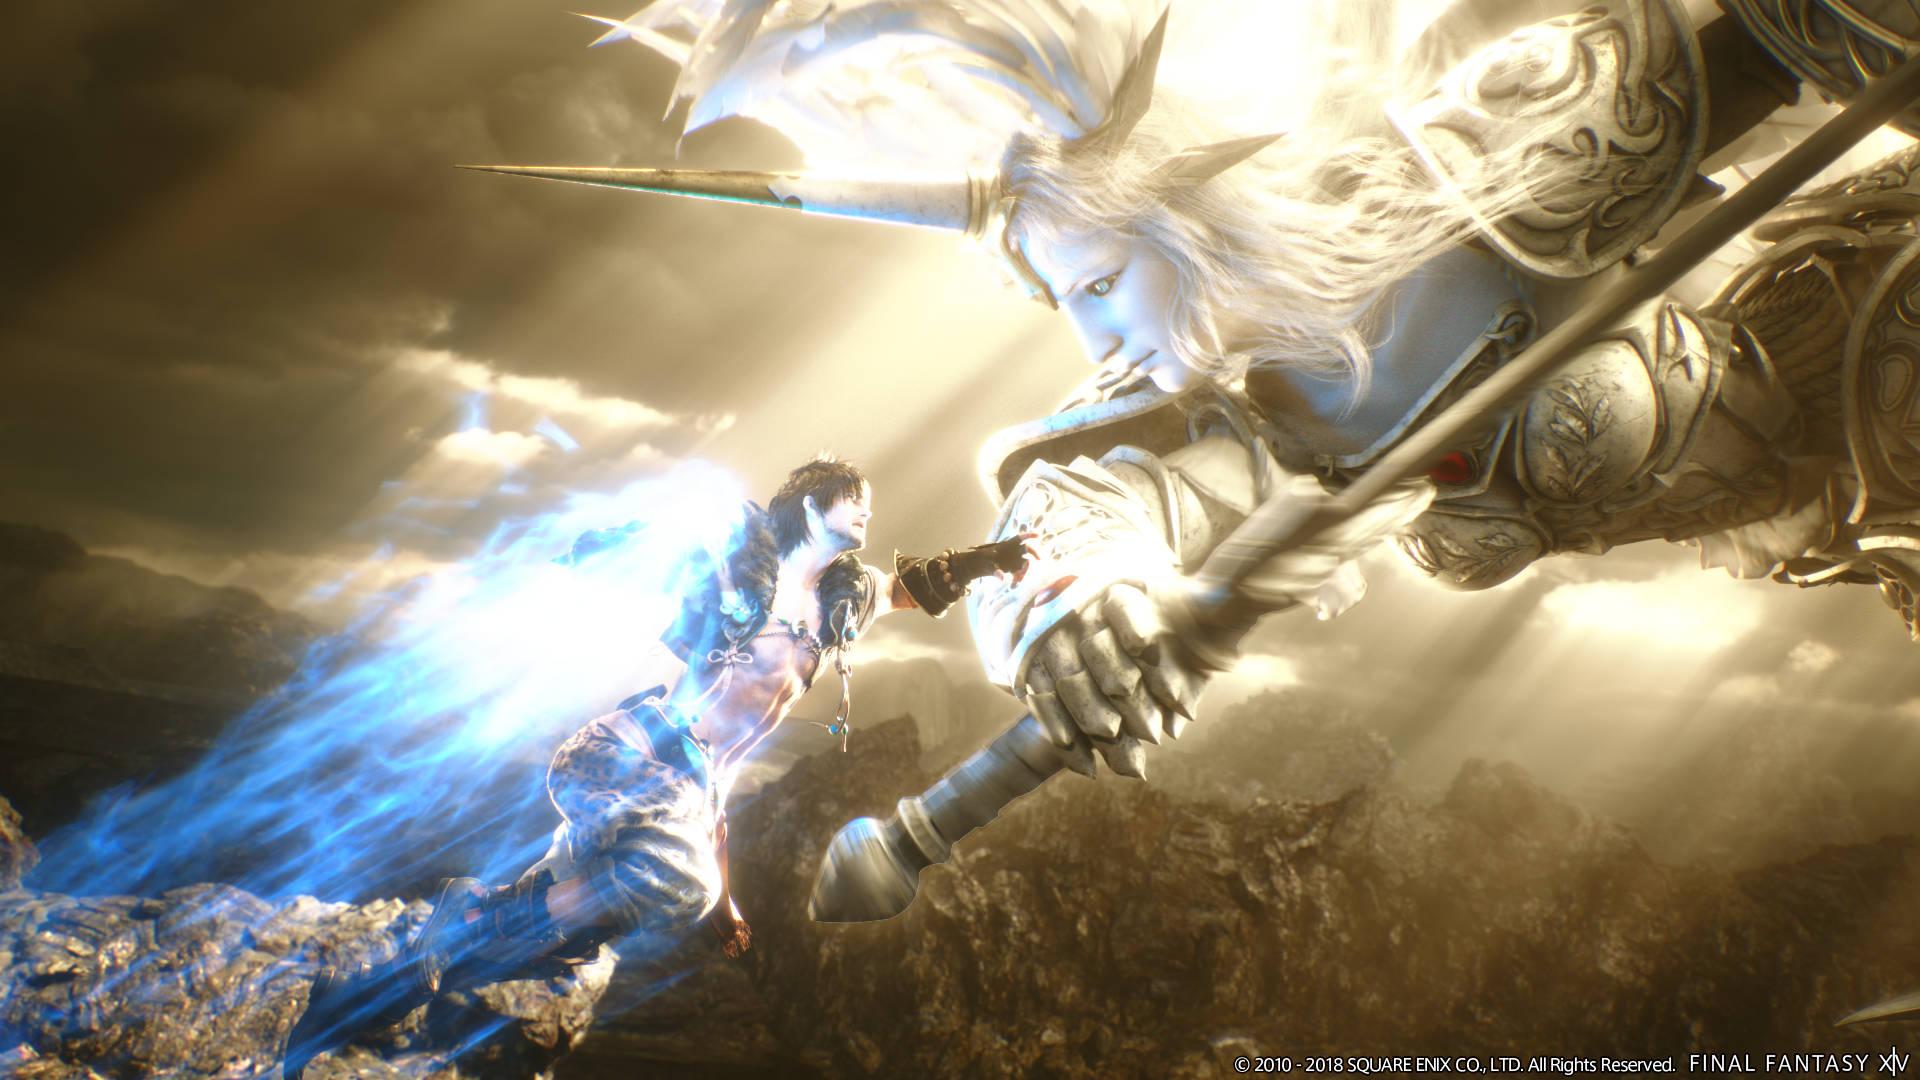 Let's Predict the New Final Fantasy XIV: Shadowbringers Jobs